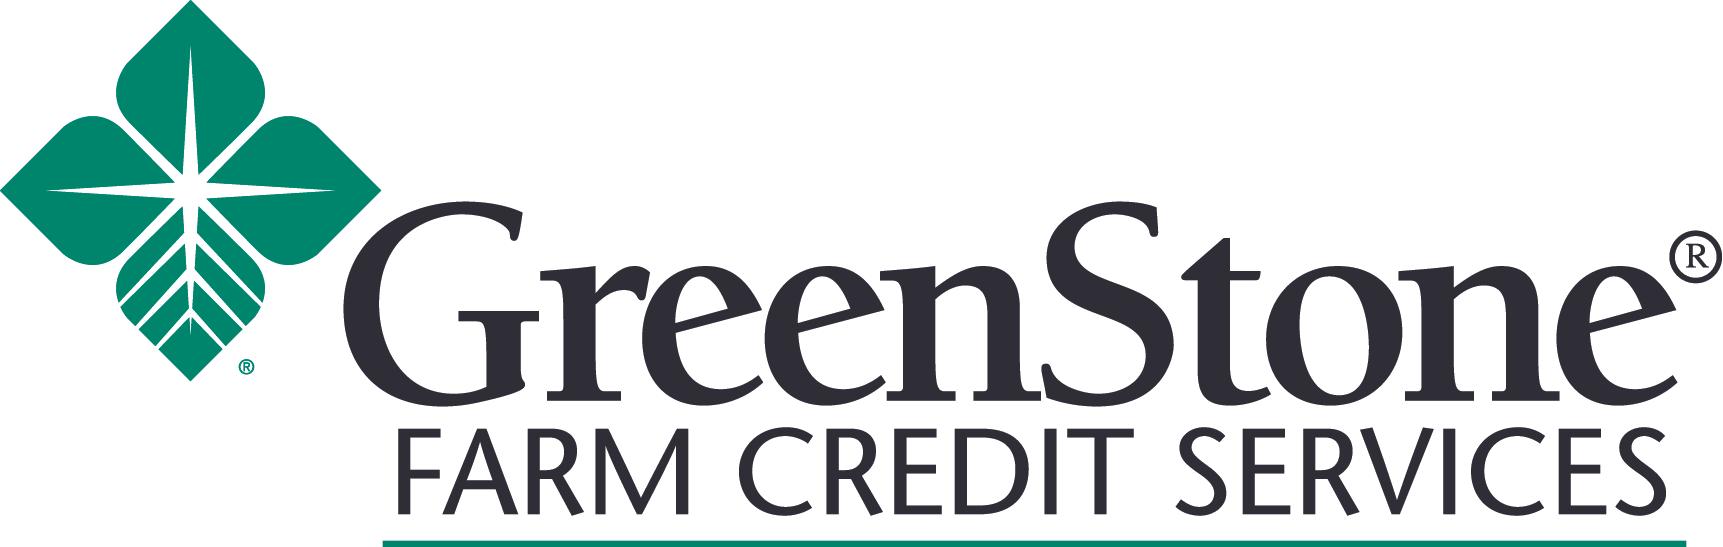 GreenStoneCMYK6in.tiff